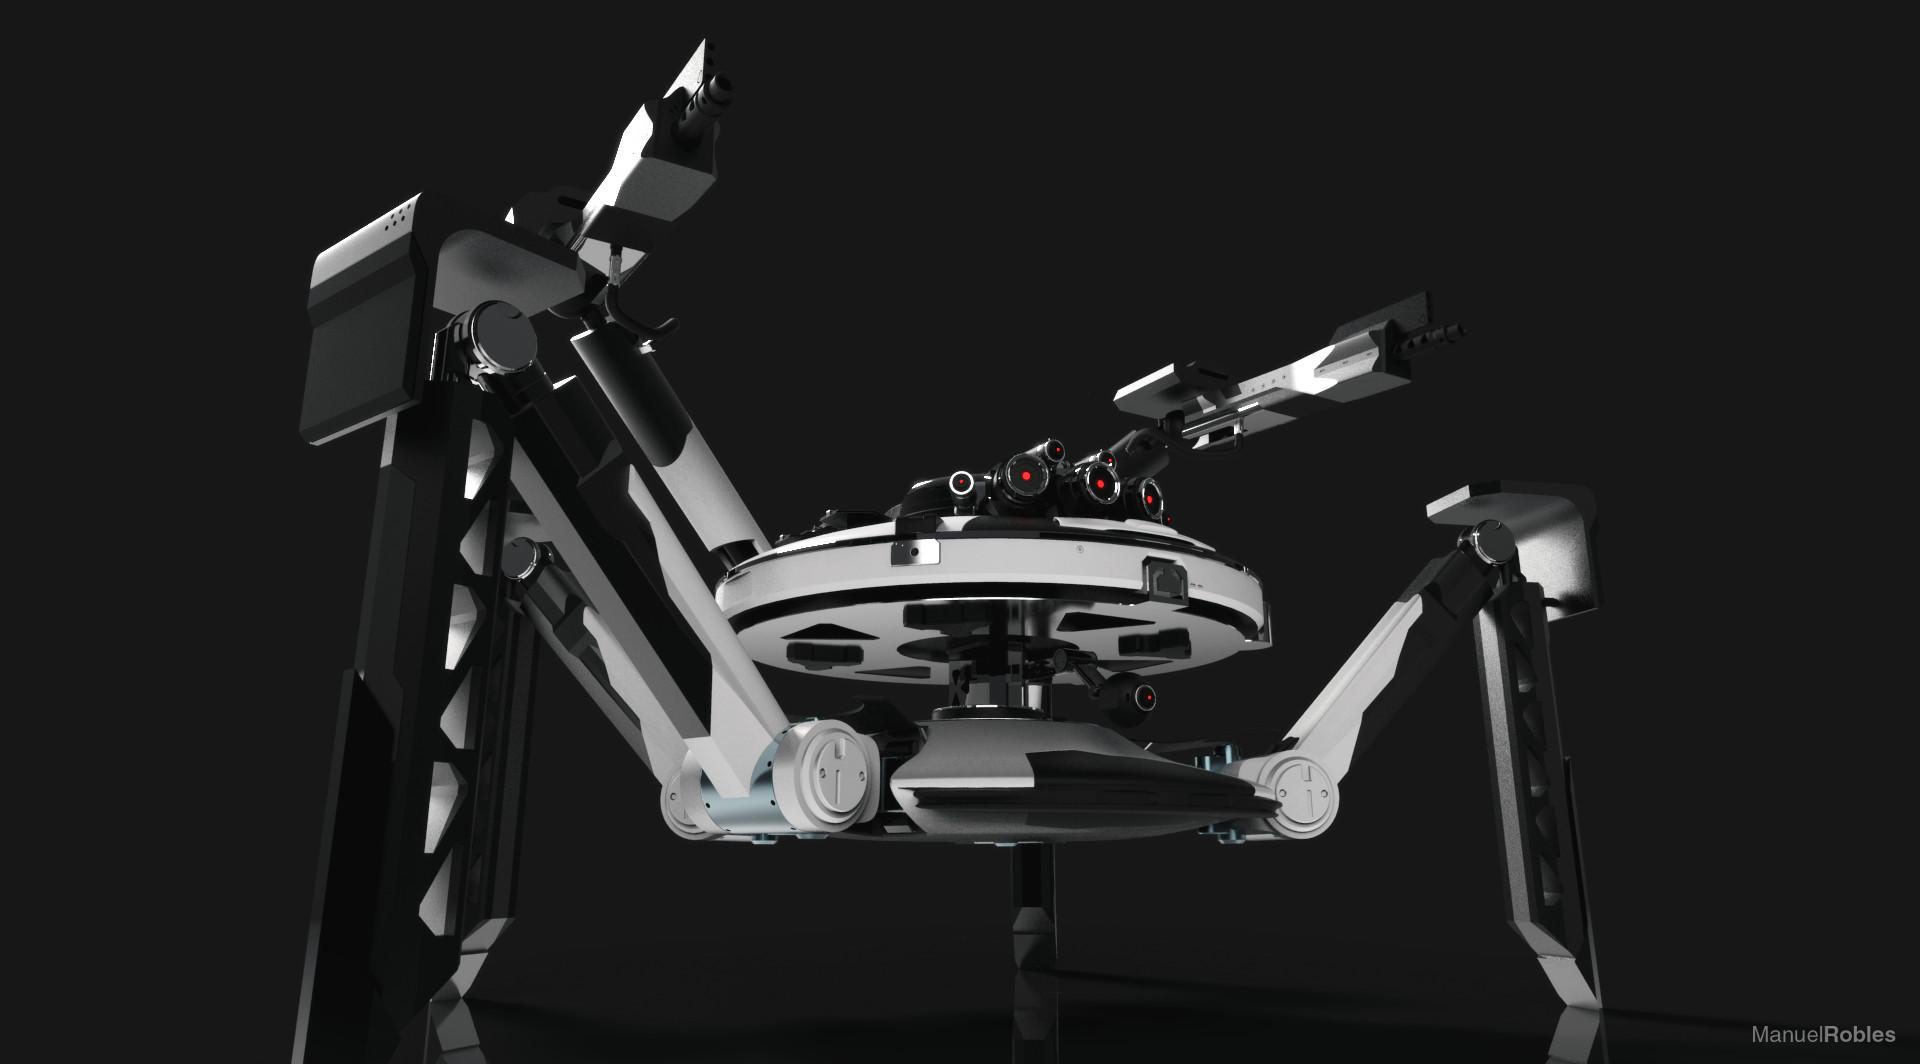 Manuel robles spider robotdron 02 viewset 32